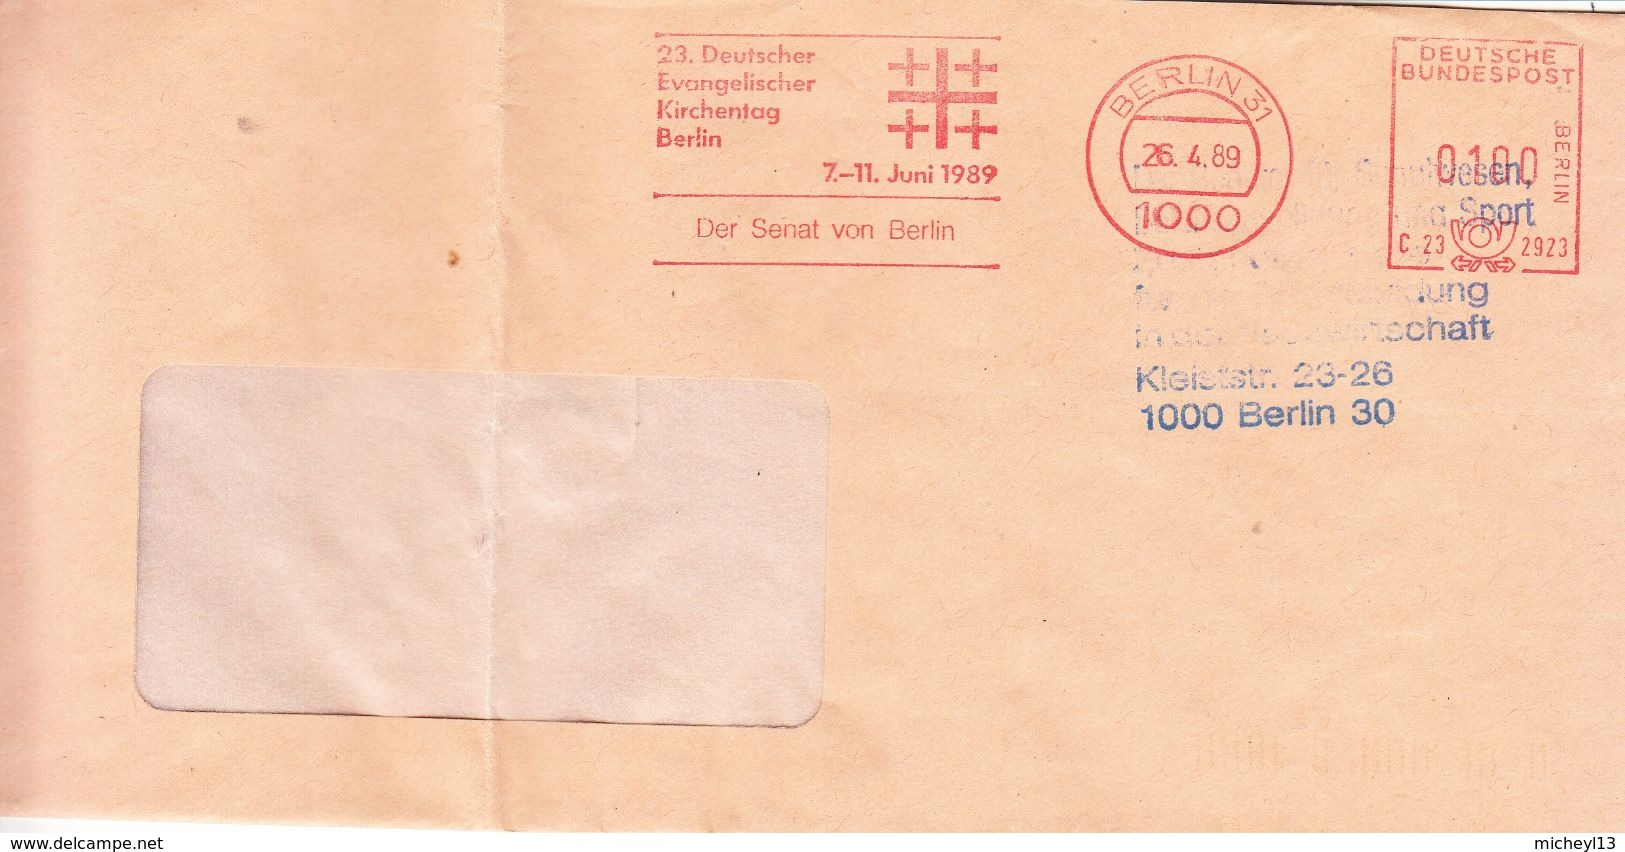 Allemagne-Berlin 31-26/04/1989-23 Deutscher Evangelischer Kirchentag Berlin-7-11 Juni 1989 - Christianity